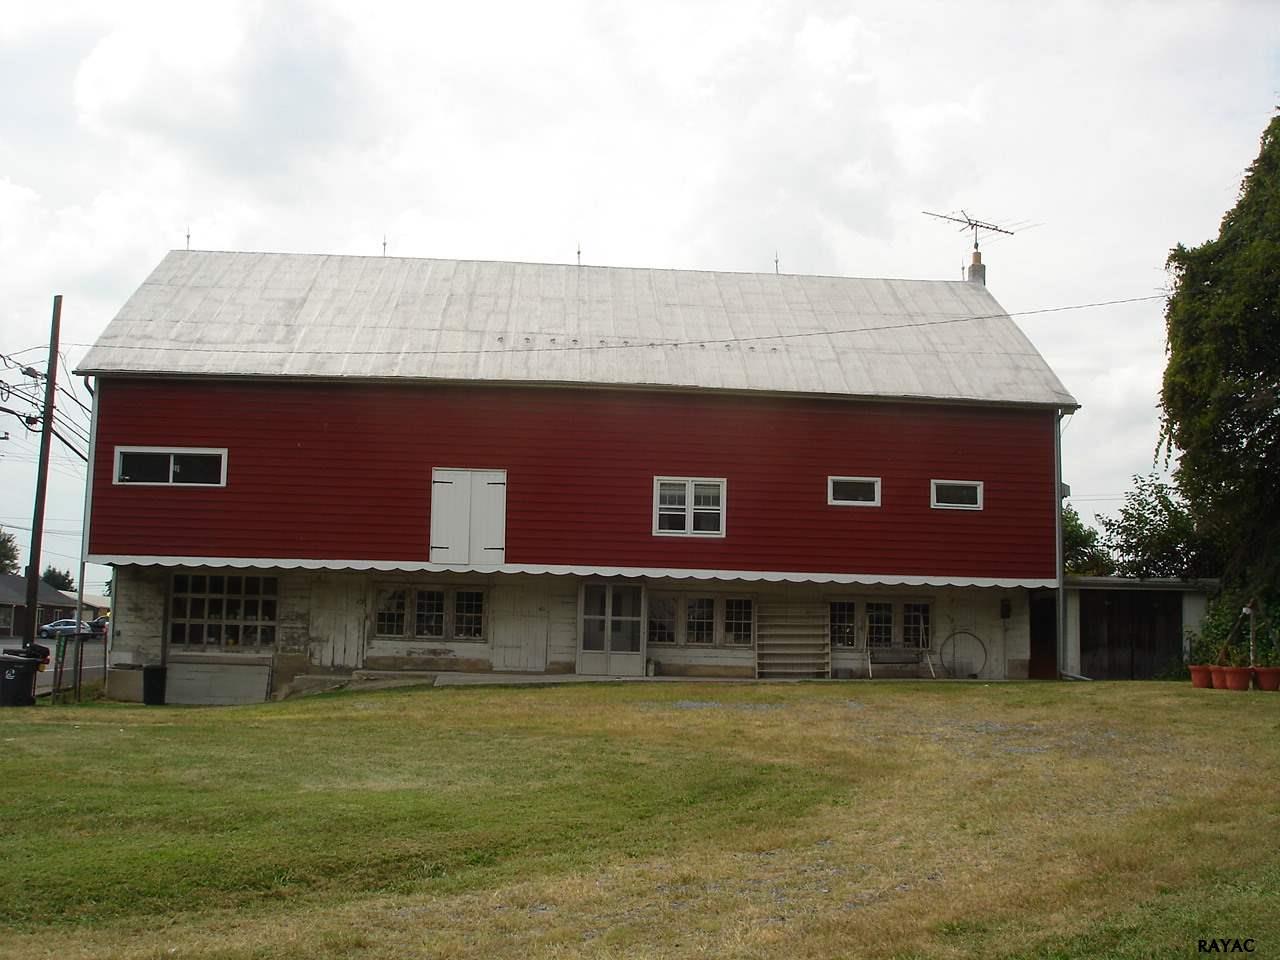 Commercial Property for Sale, ListingId:36391161, location: 1924 York Road Gettysburg 17325